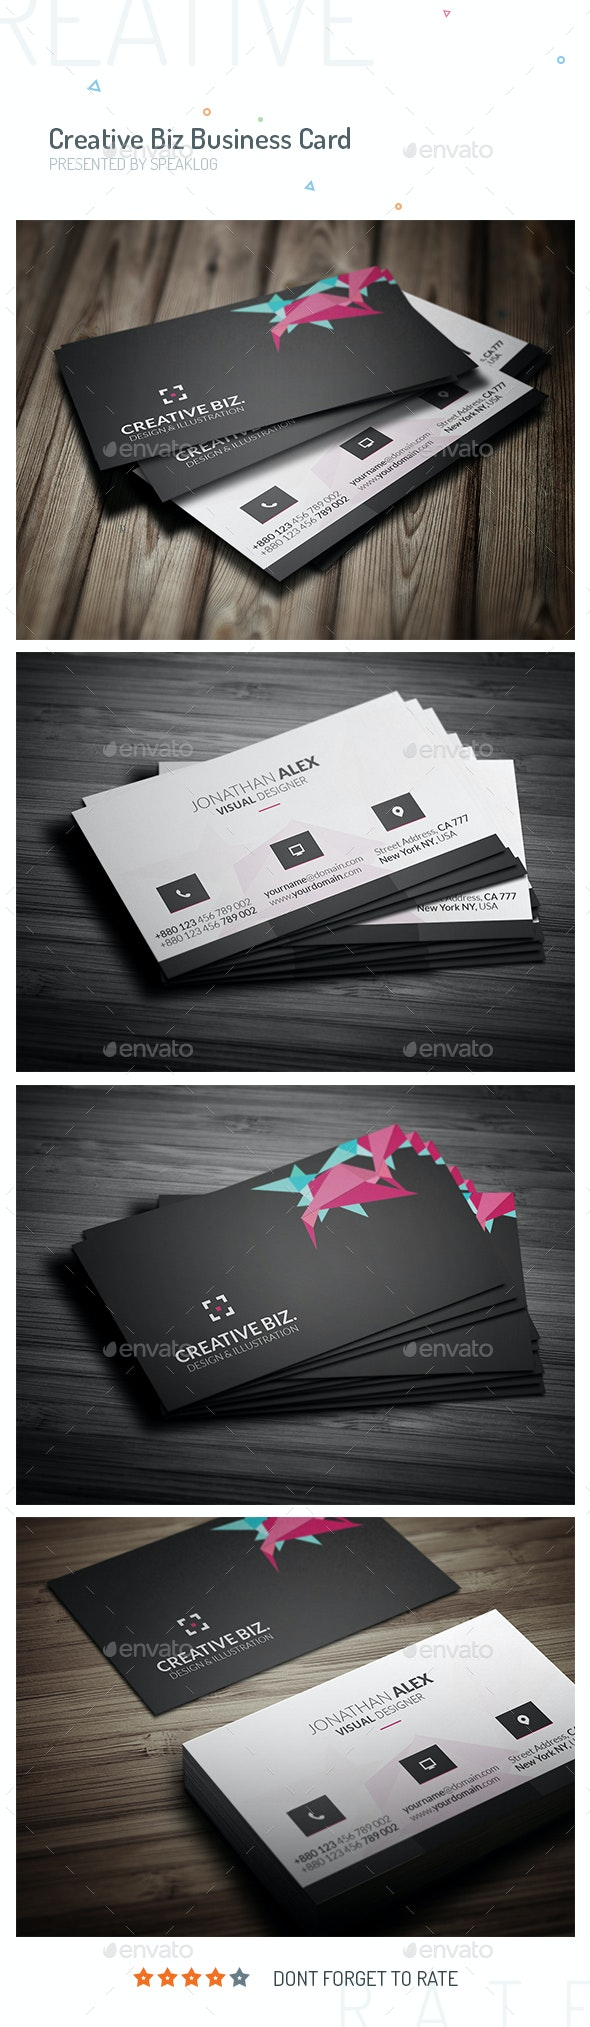 CreativeCard Business Card Design V.02 - Creative Business Cards